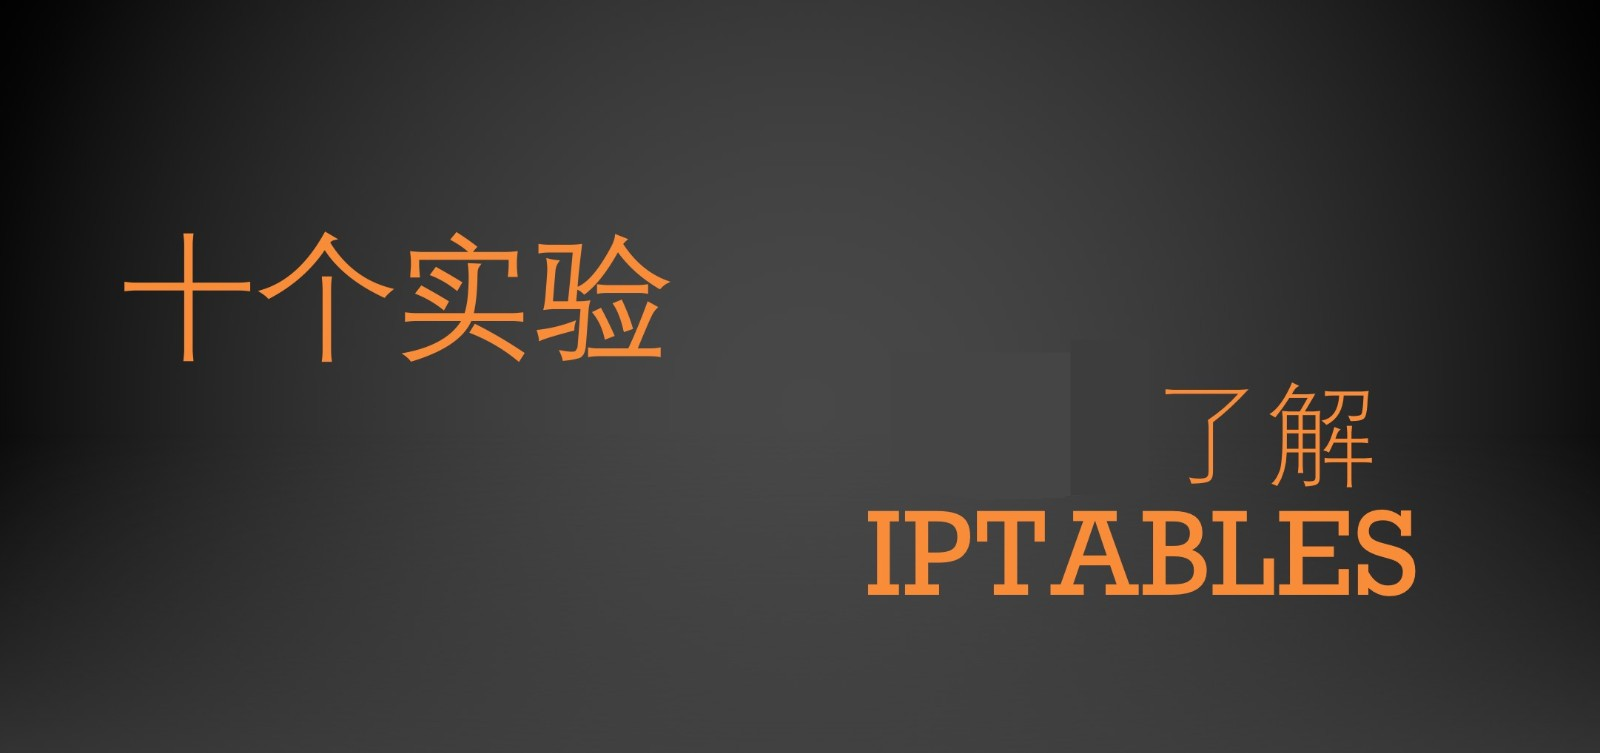 IPTABLES十个实验让你了解iptables视频教程